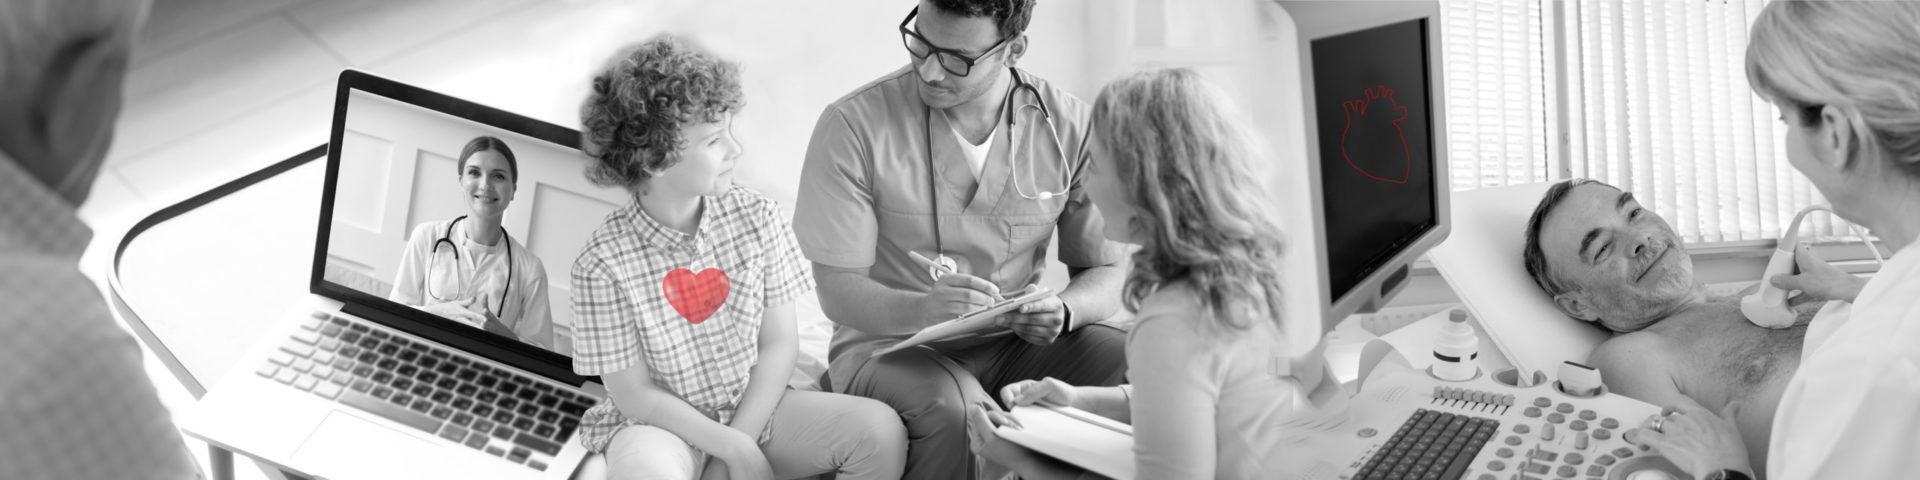 Clincial care4084x1021